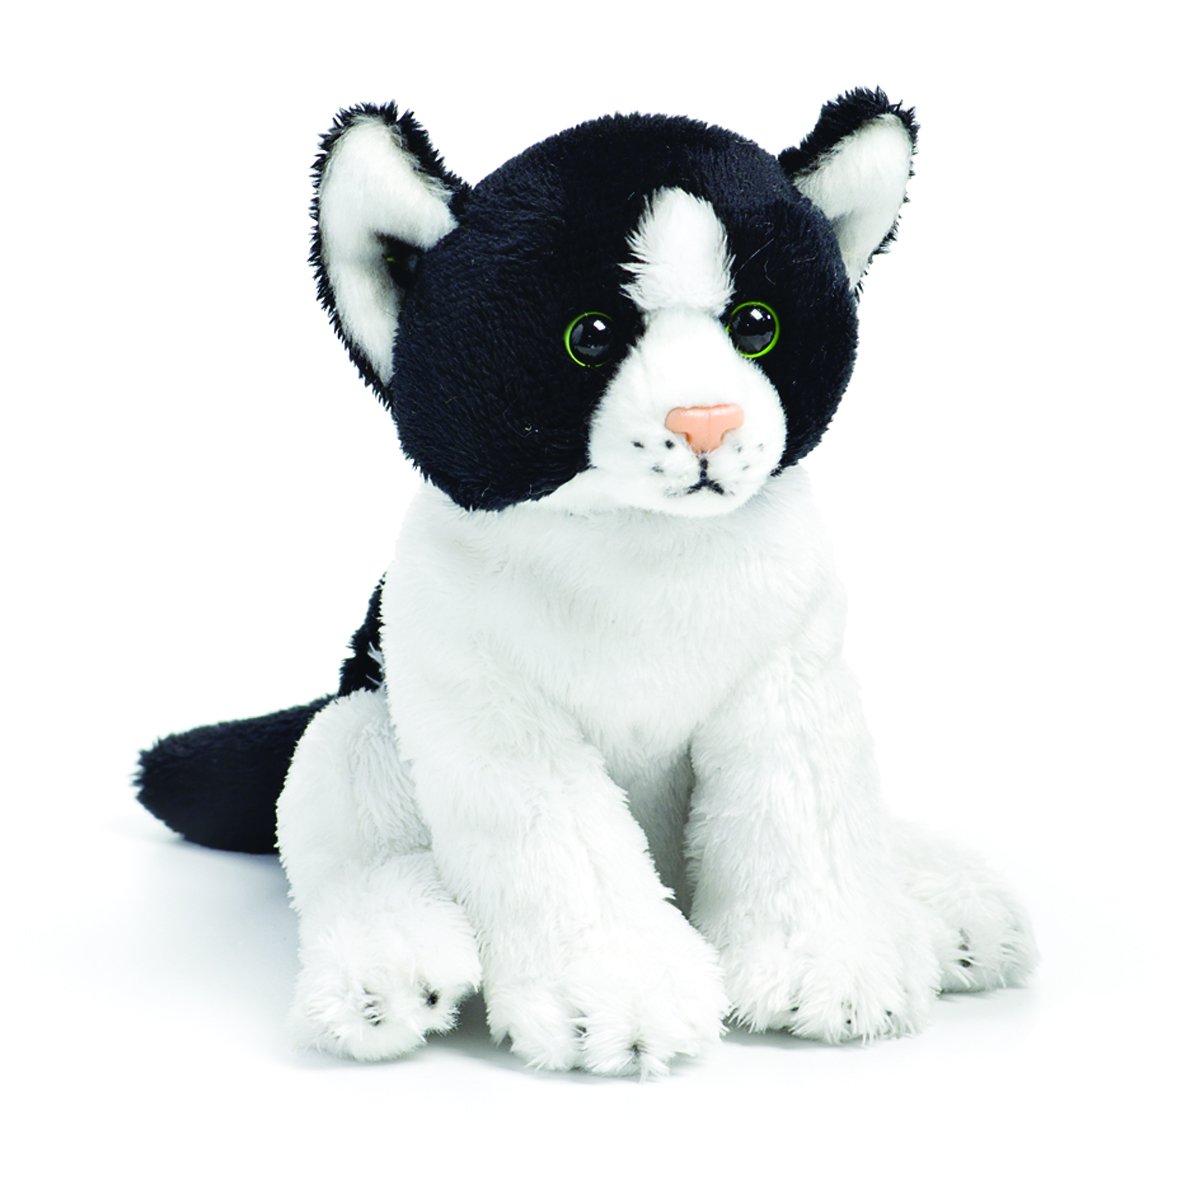 DEMDACO Black and White Sitting Cat Children's Plush Beanbag Stuffed Animal Toy